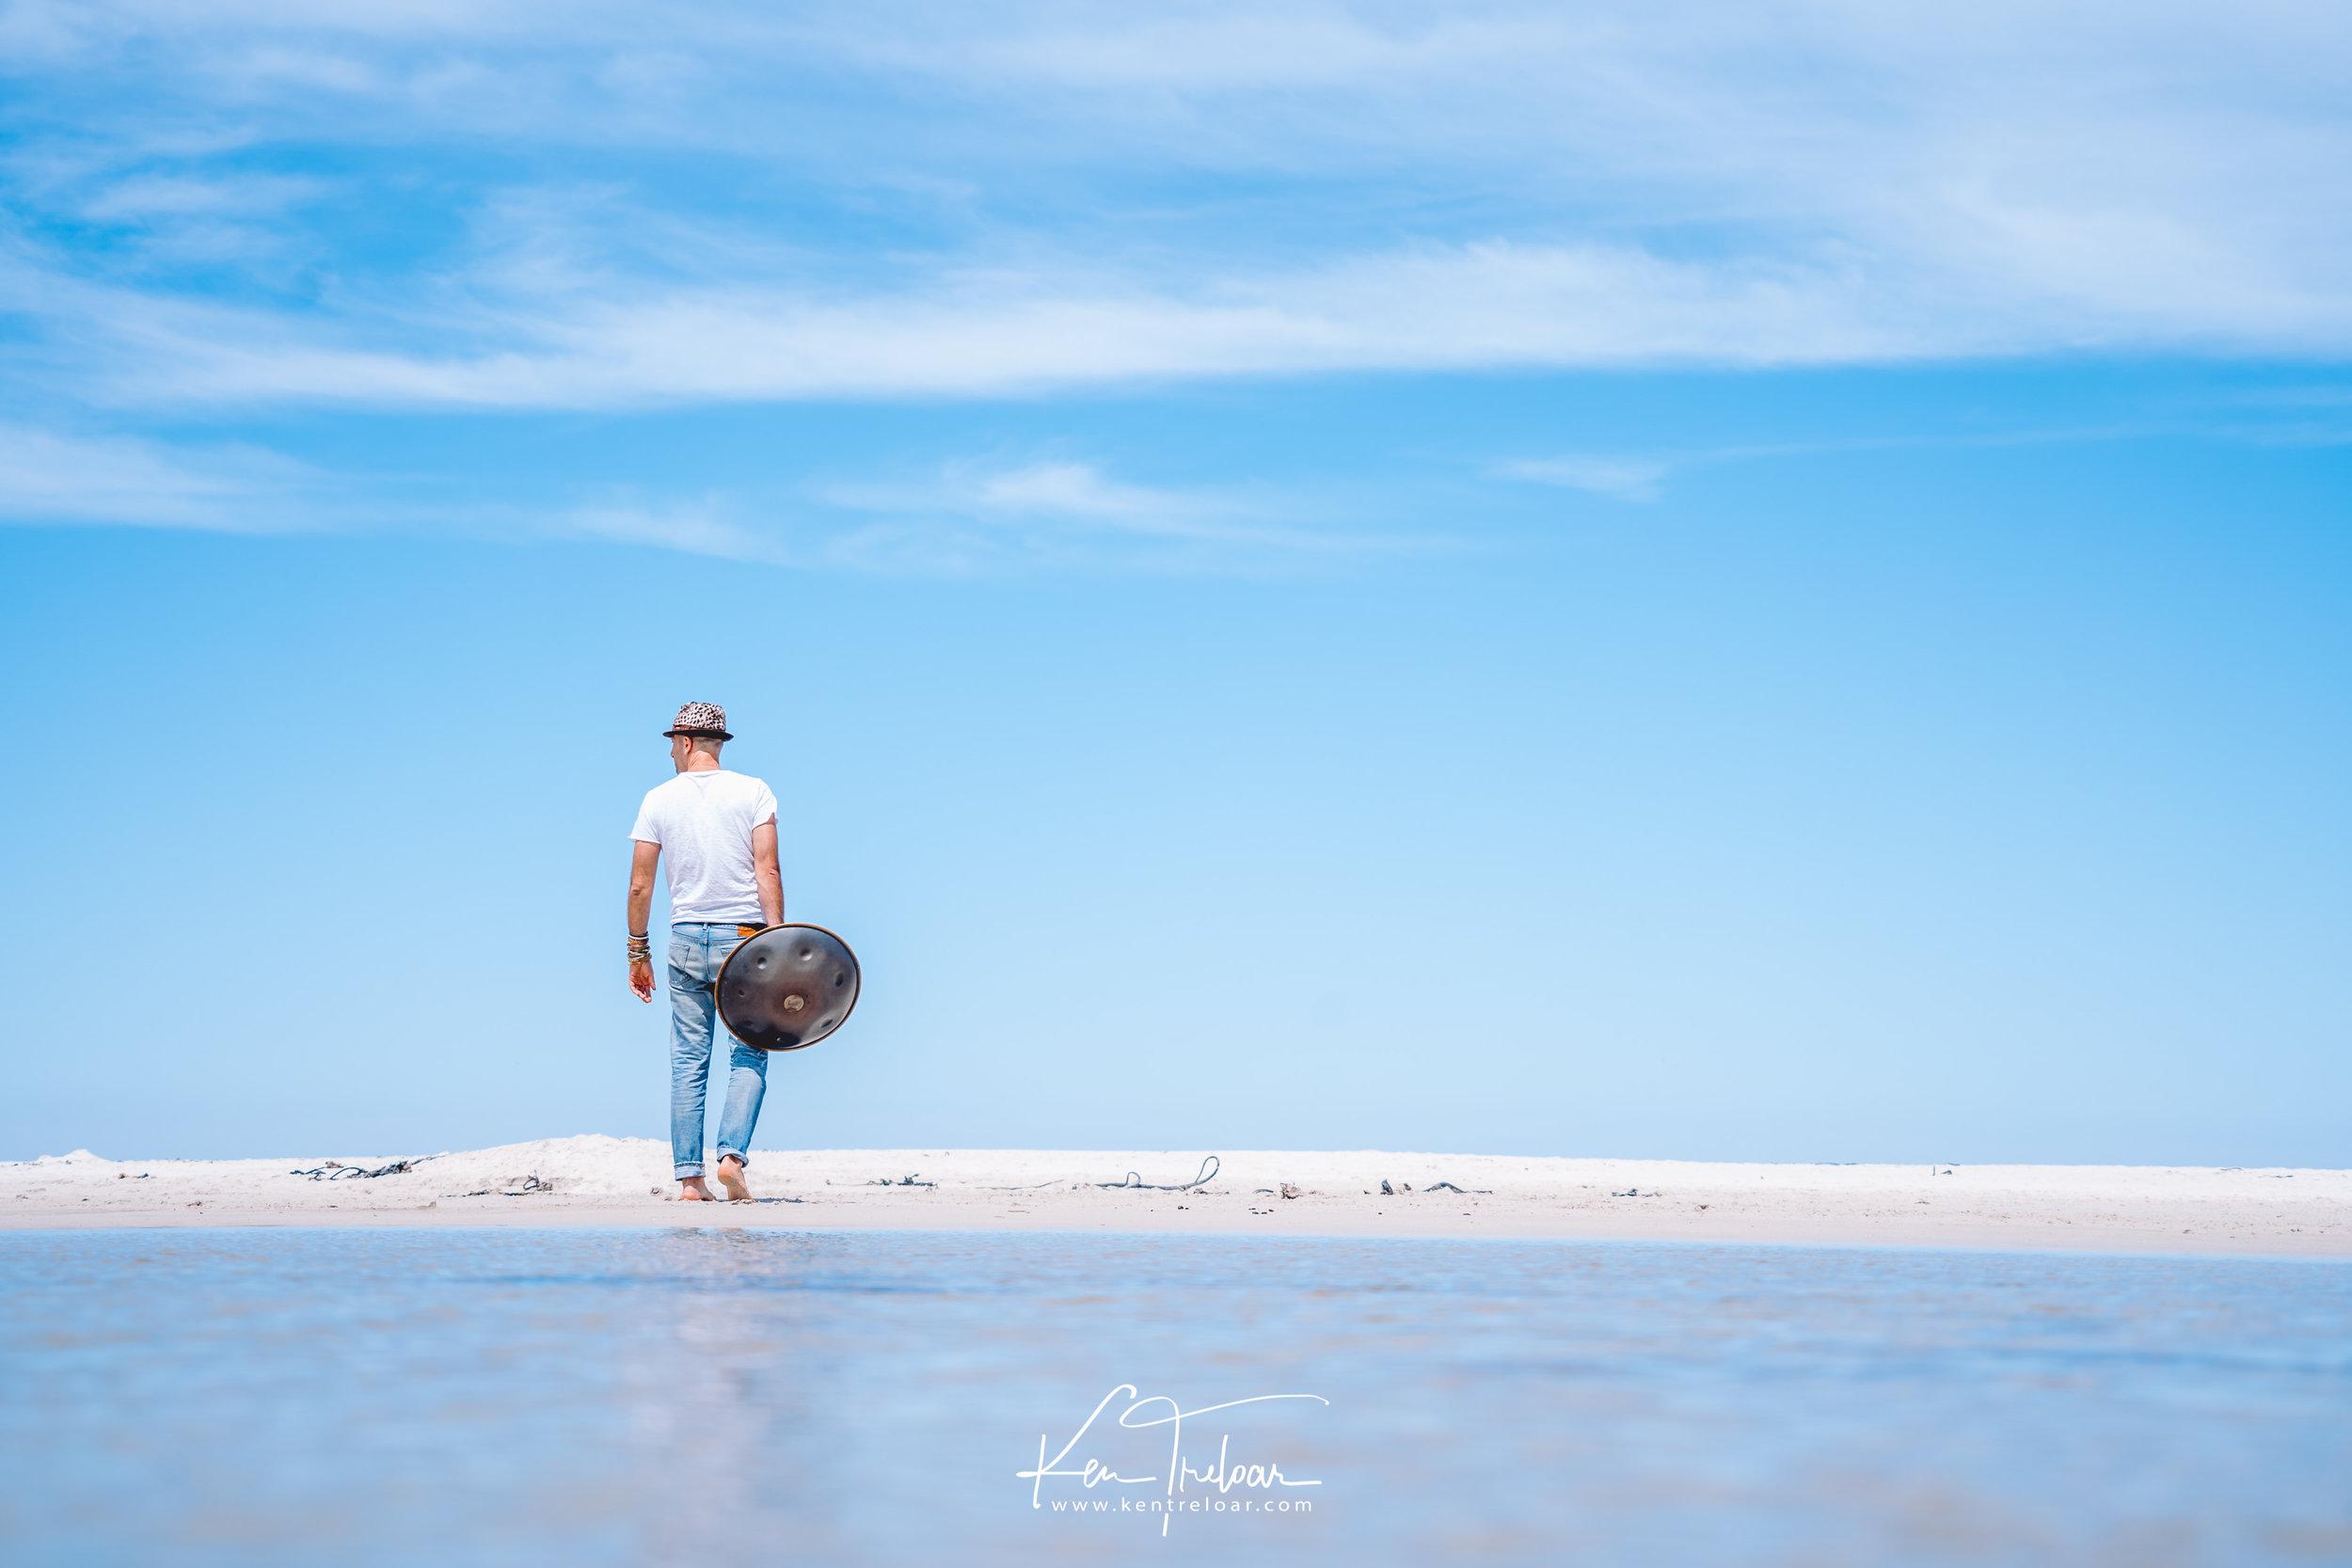 Marci Selvaggio - Hang Instrument Cape Town Tour - South Afica - Noordhoek Beach -  Image by Ken Treloar-4.jpg